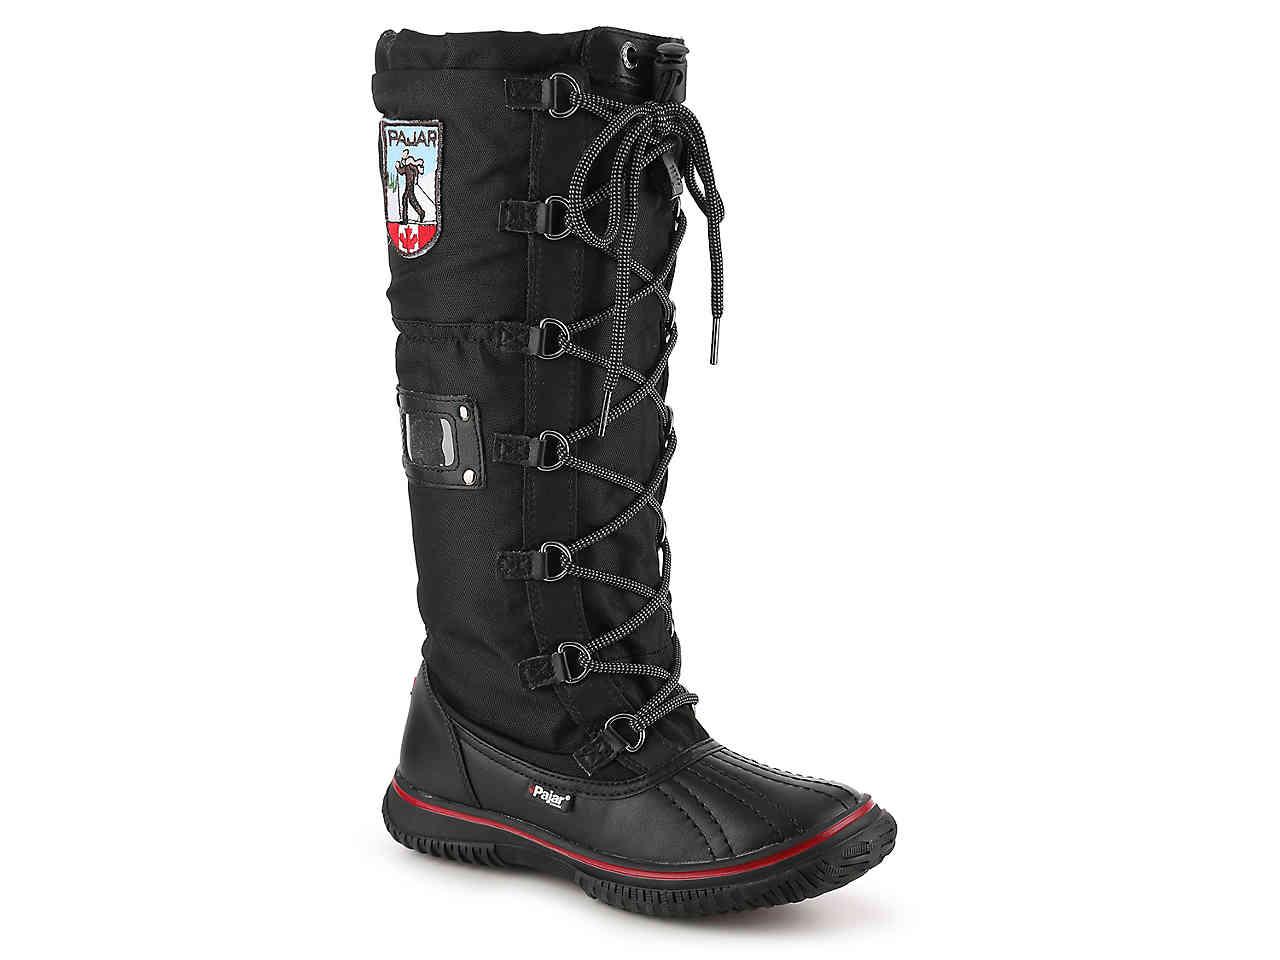 Pajar Boots grip snow boot DTWIJEA